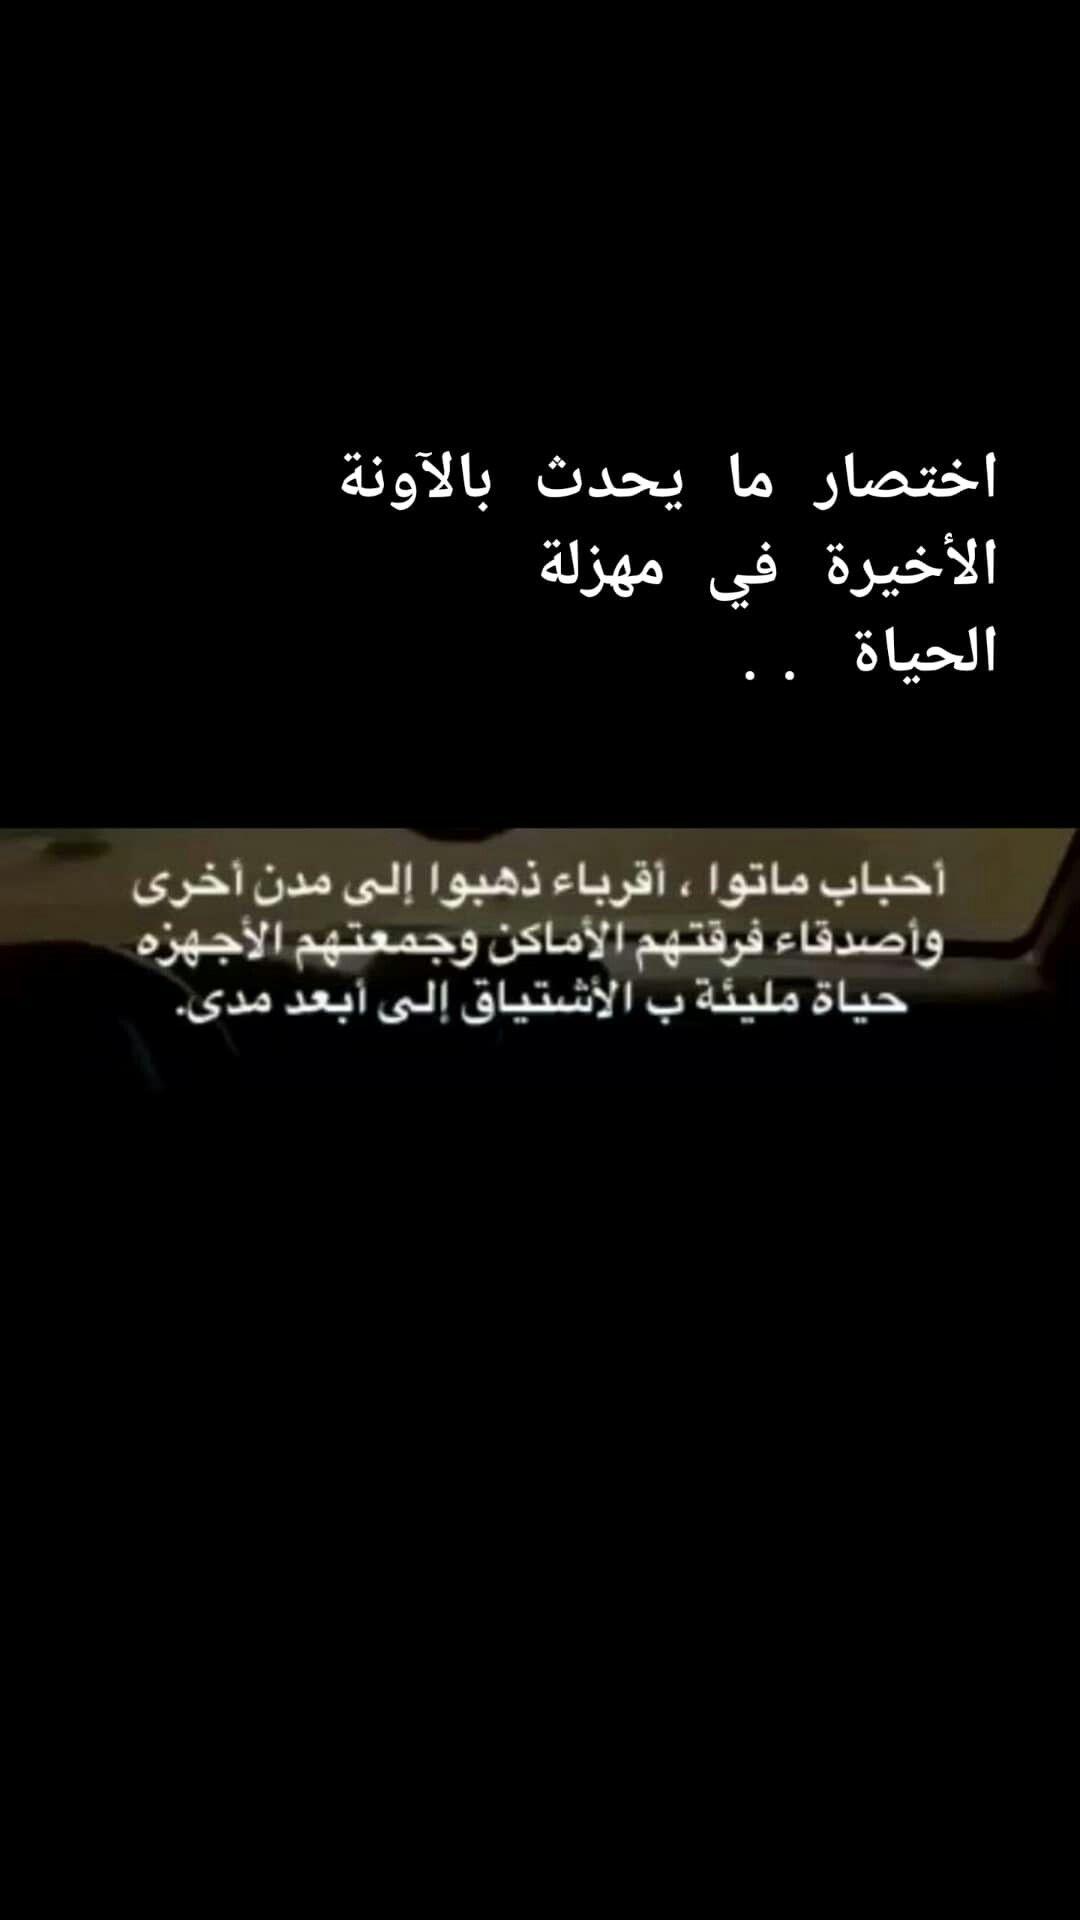 Pin By Nancy On Arabic Quotes اقتباسات عربية Love Words Quotes Words